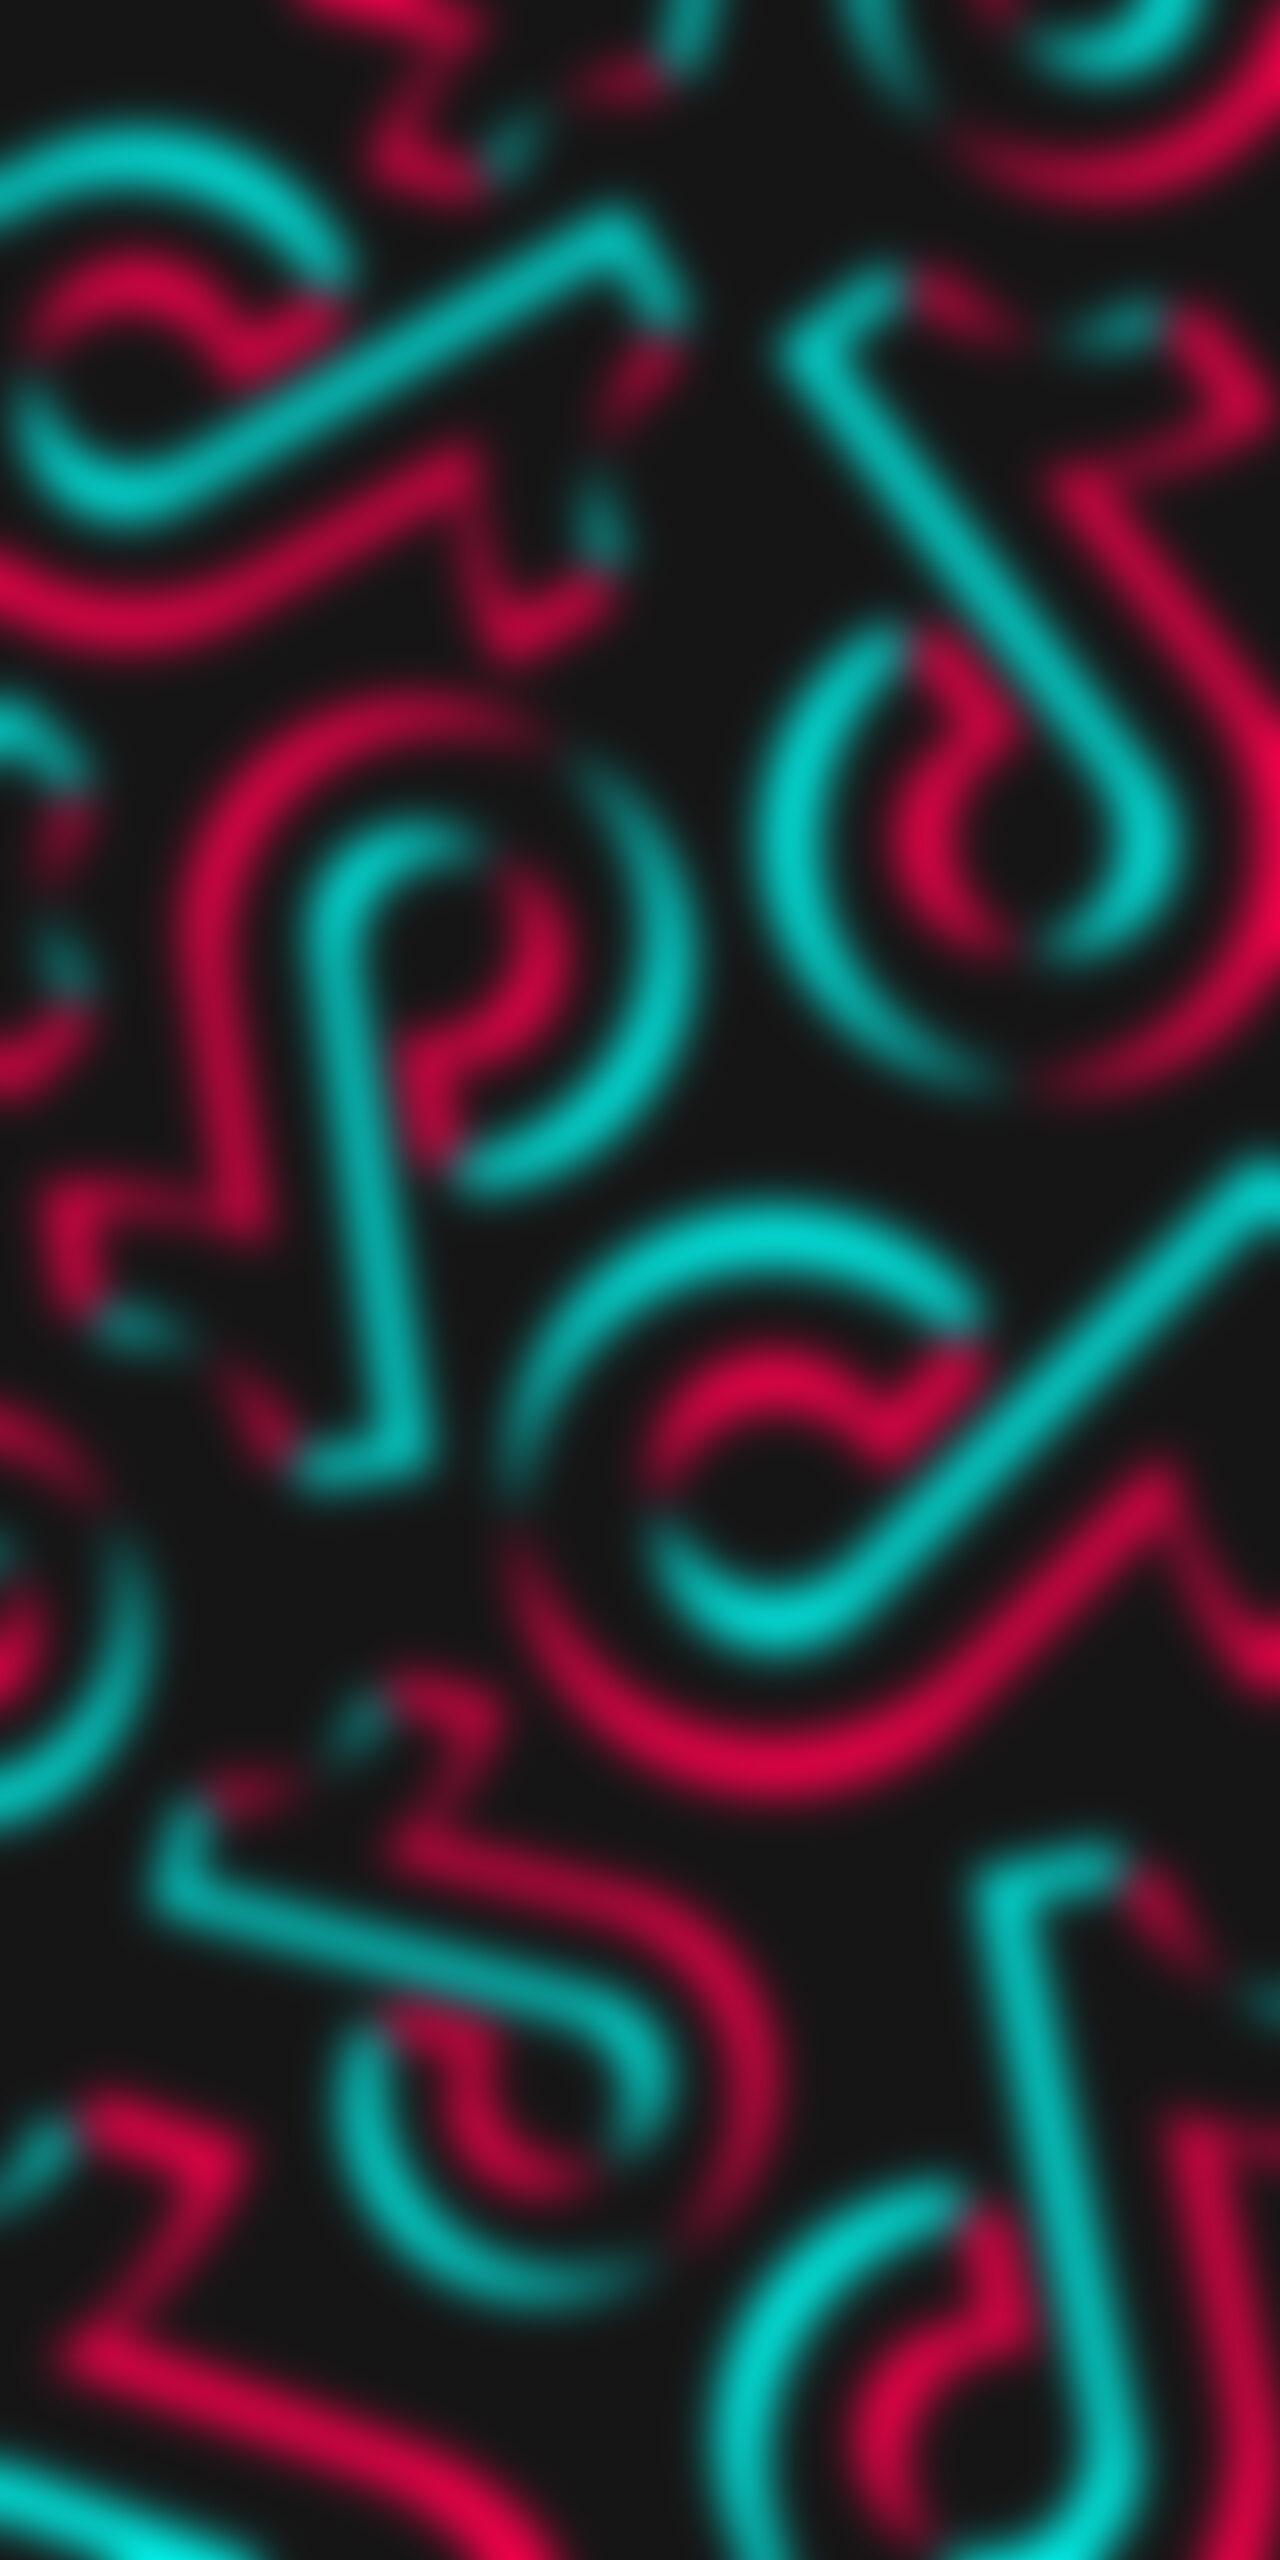 tik tok logo black blur wallpaper